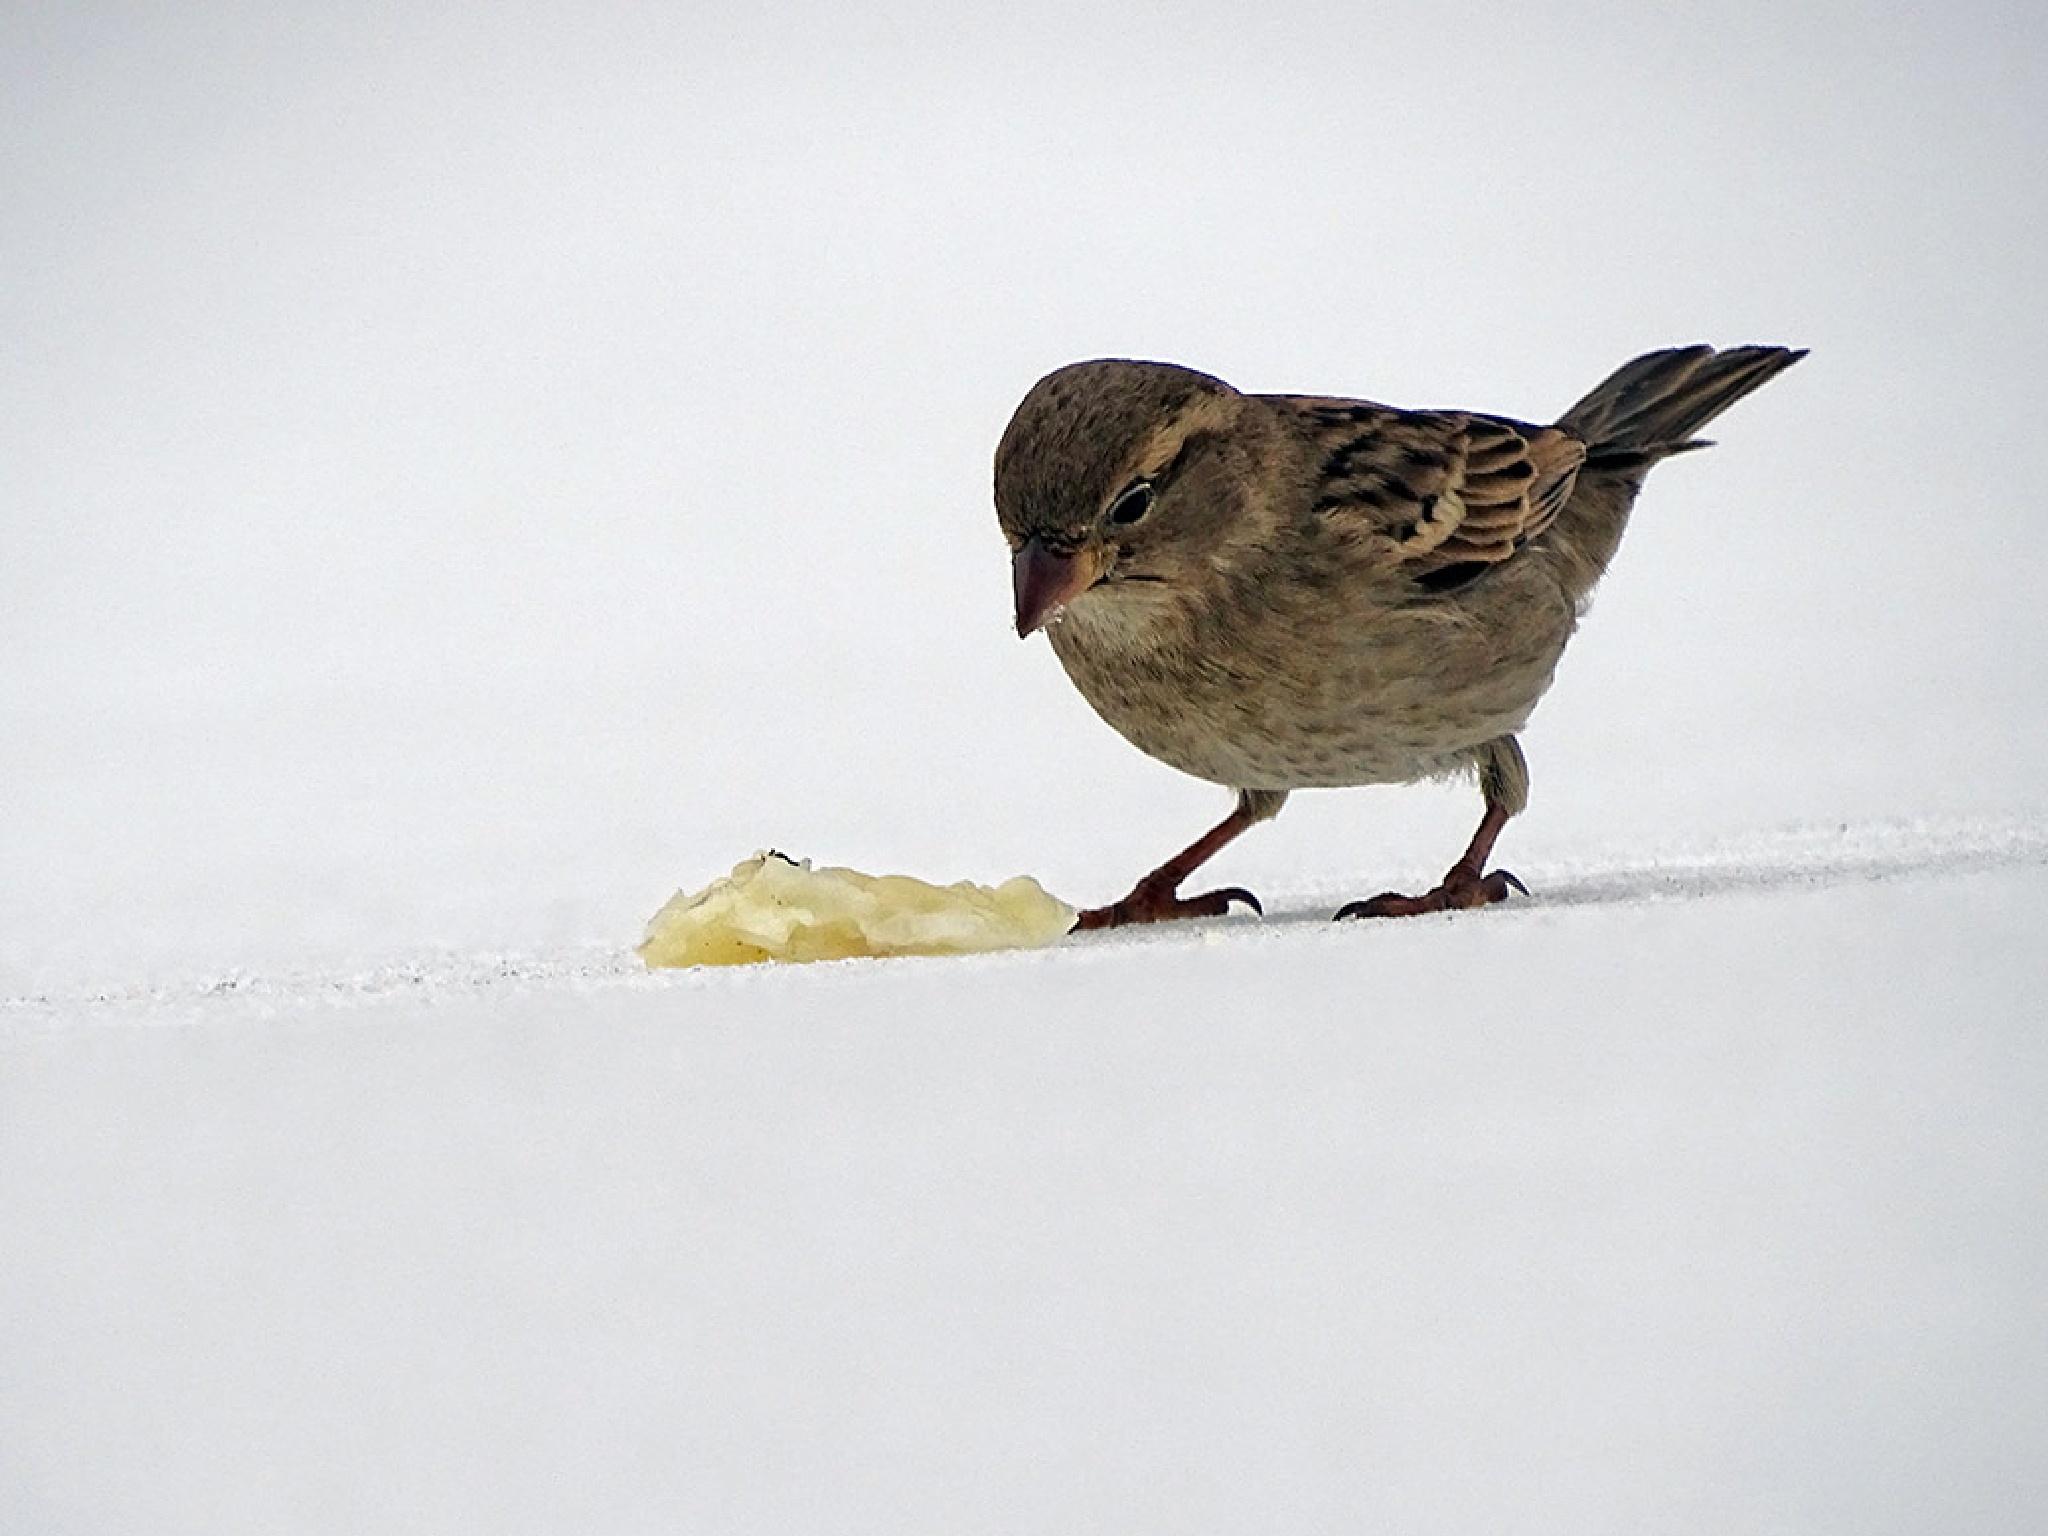 Sparrow by Jamal -Kurdistan